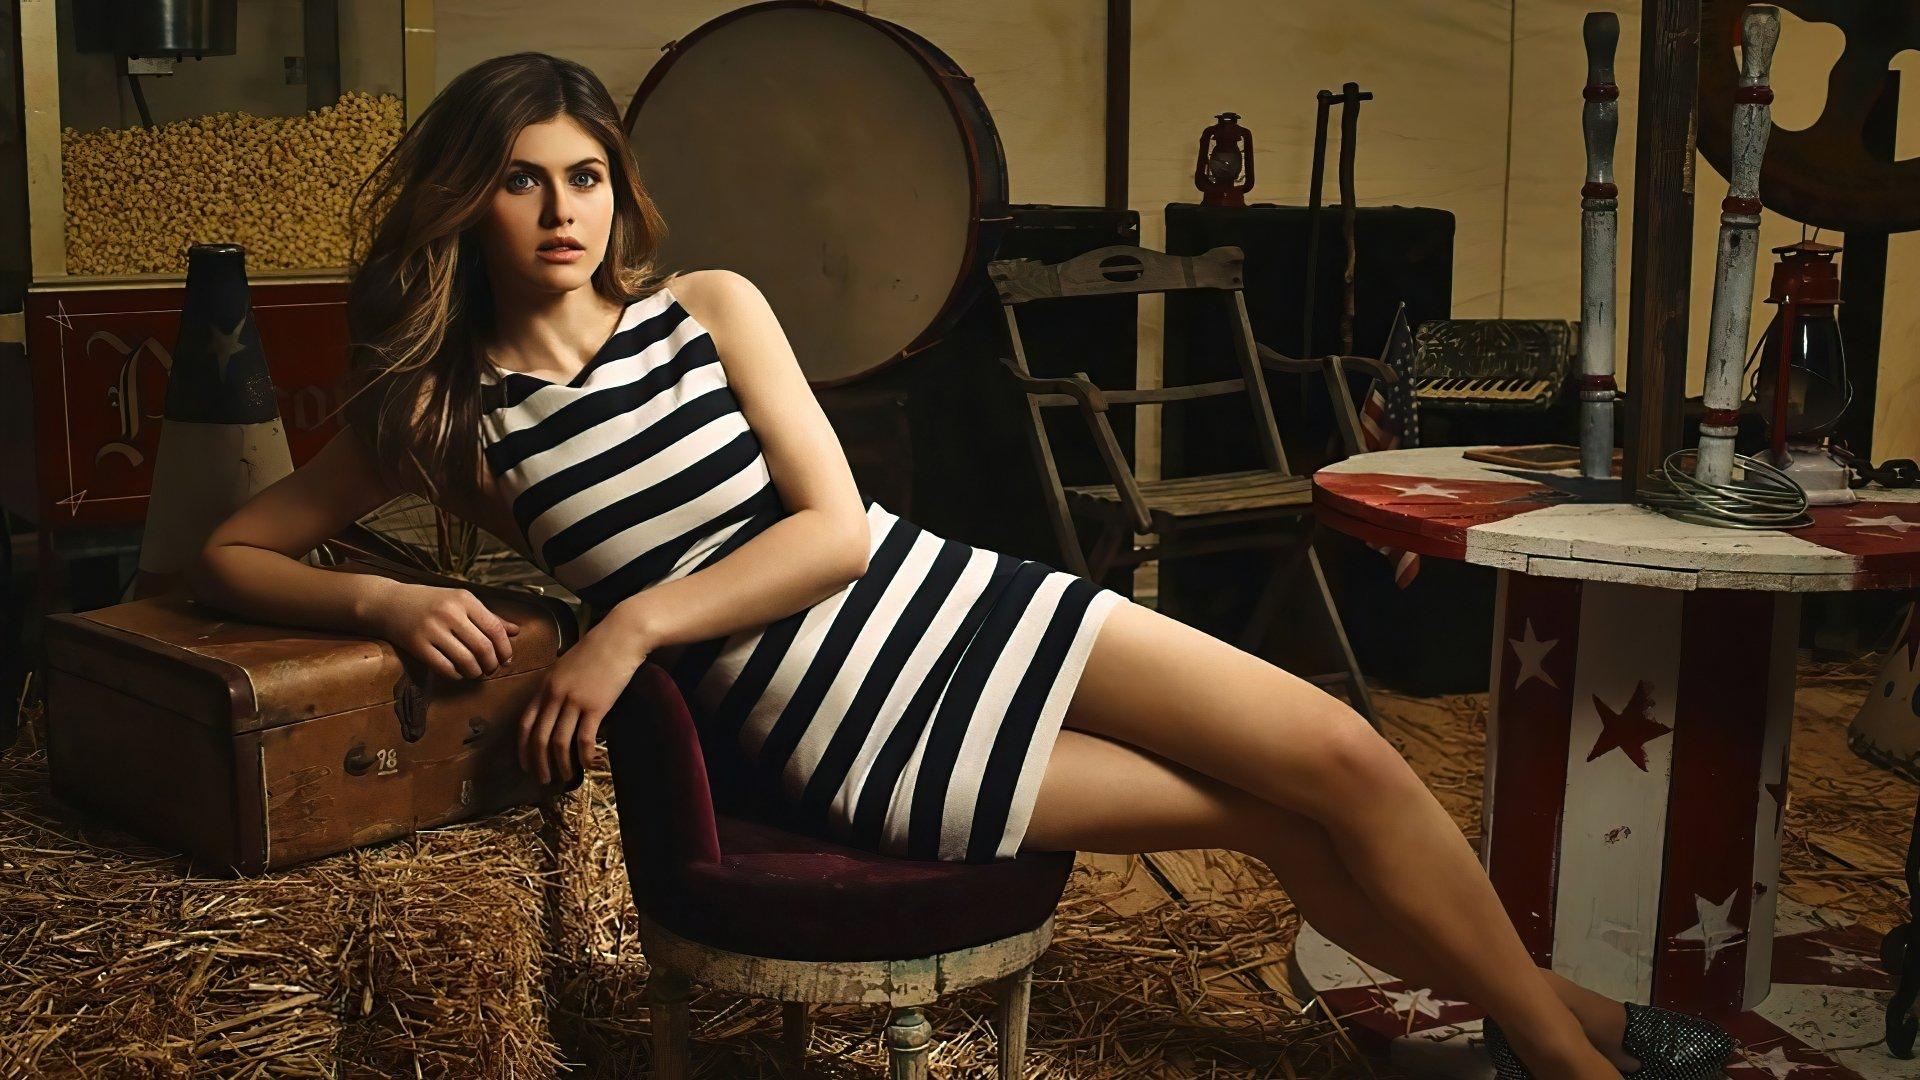 LoadingReadyRuns Kate Stark : Request Celebrity Cum